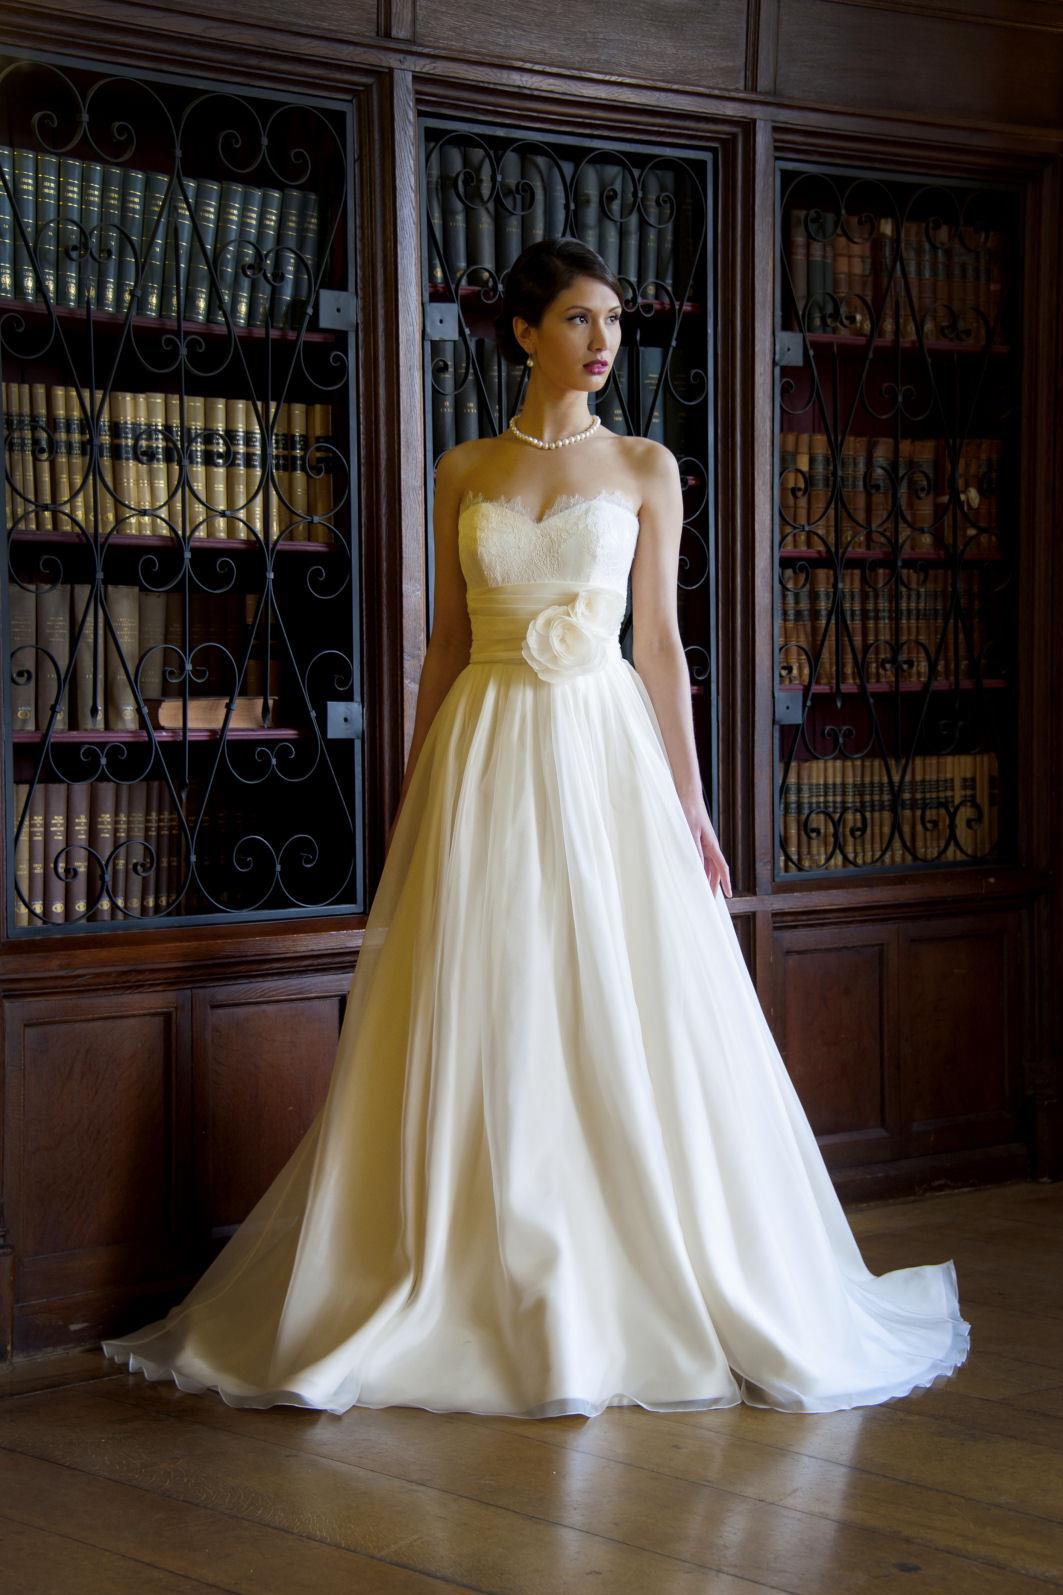 ross wedding dresses photo - 1